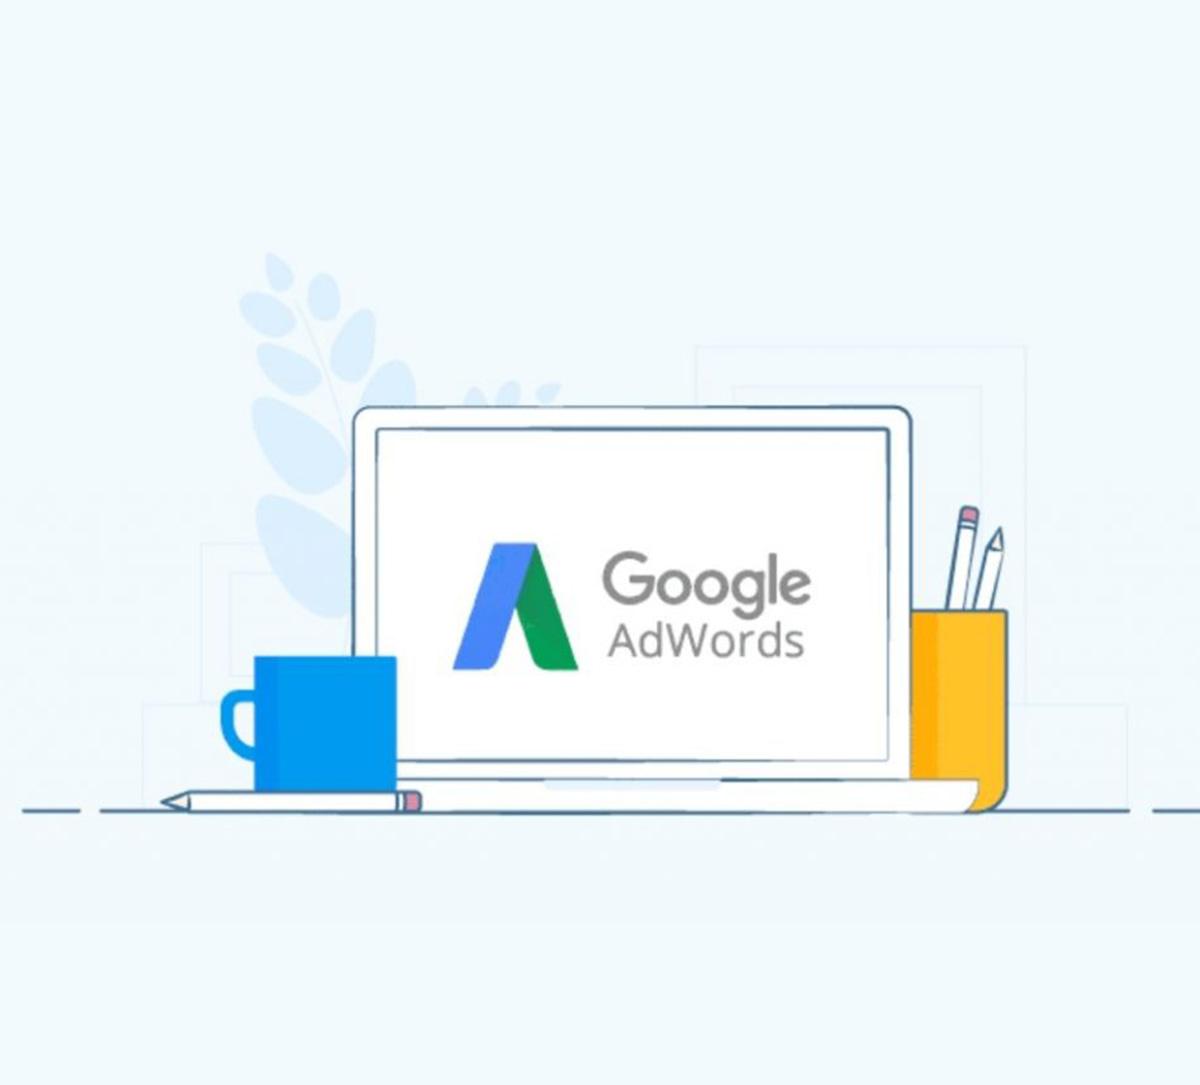 https://ml8bxbbz7pj9.i.optimole.com/kcjfi9Q.mVbO~6367f/w:auto/h:auto/q:90/https://arksstech.com/wp-content/upload/2018/06/google-adwrd.png